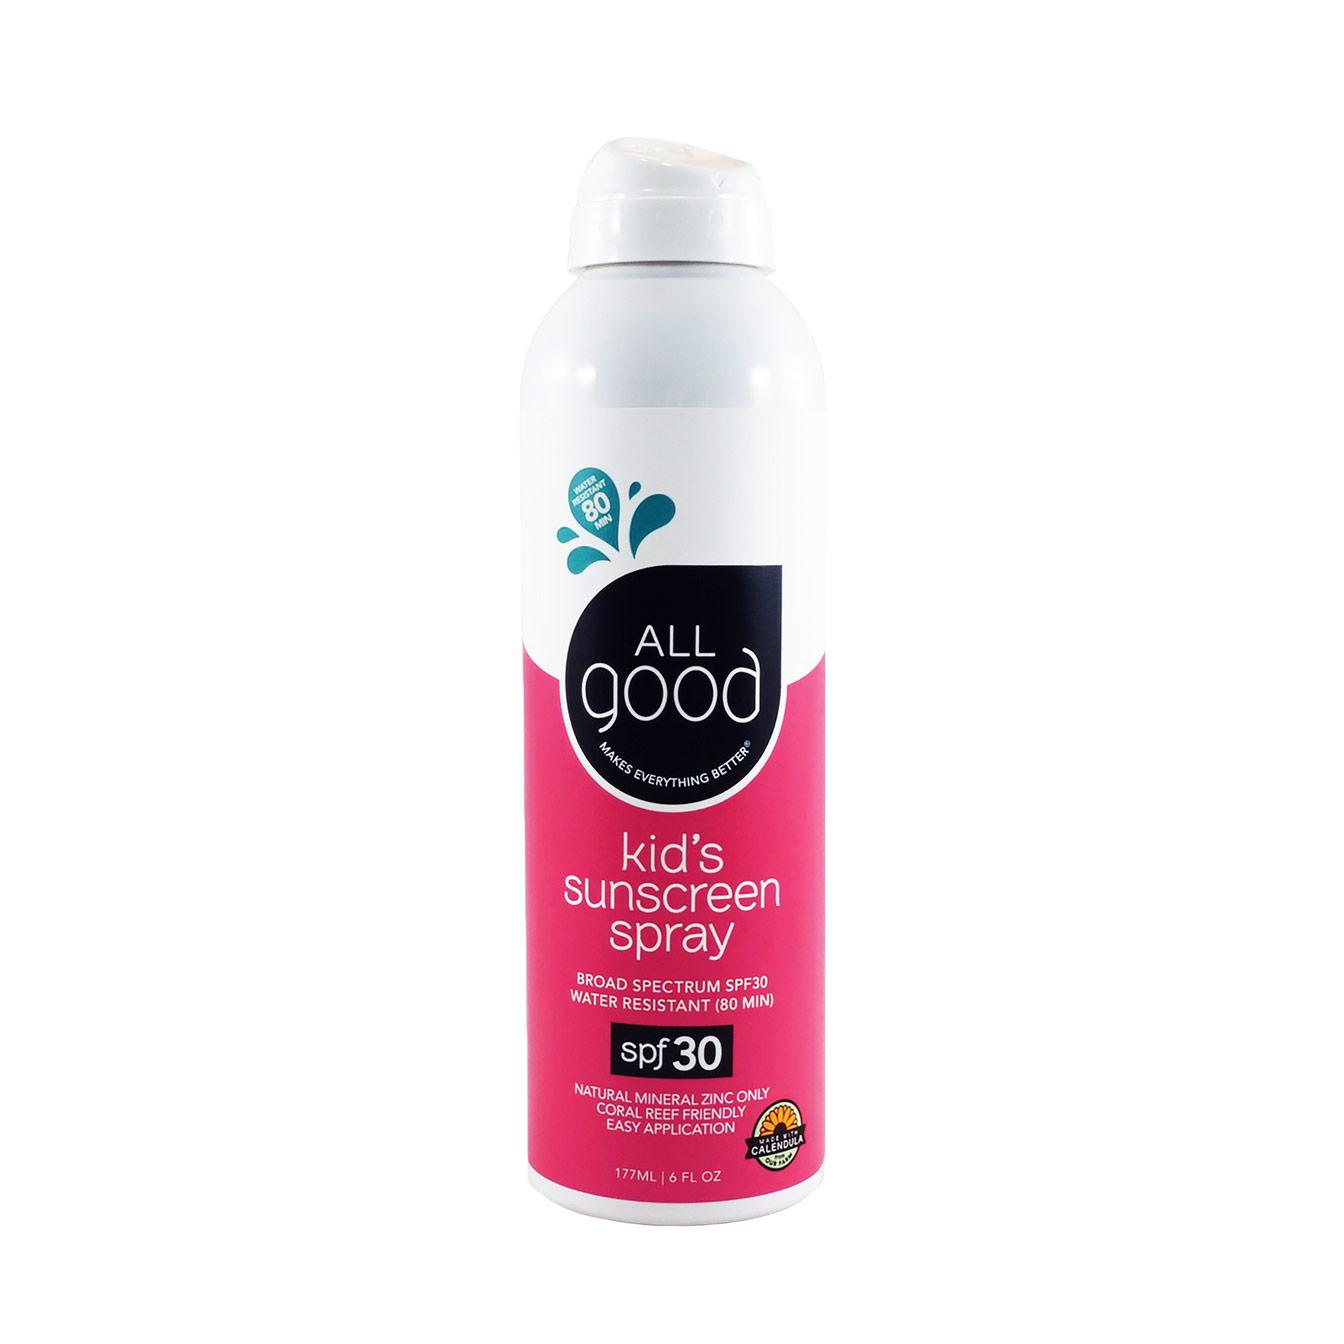 SPF30 Kids Sunscreen Spray